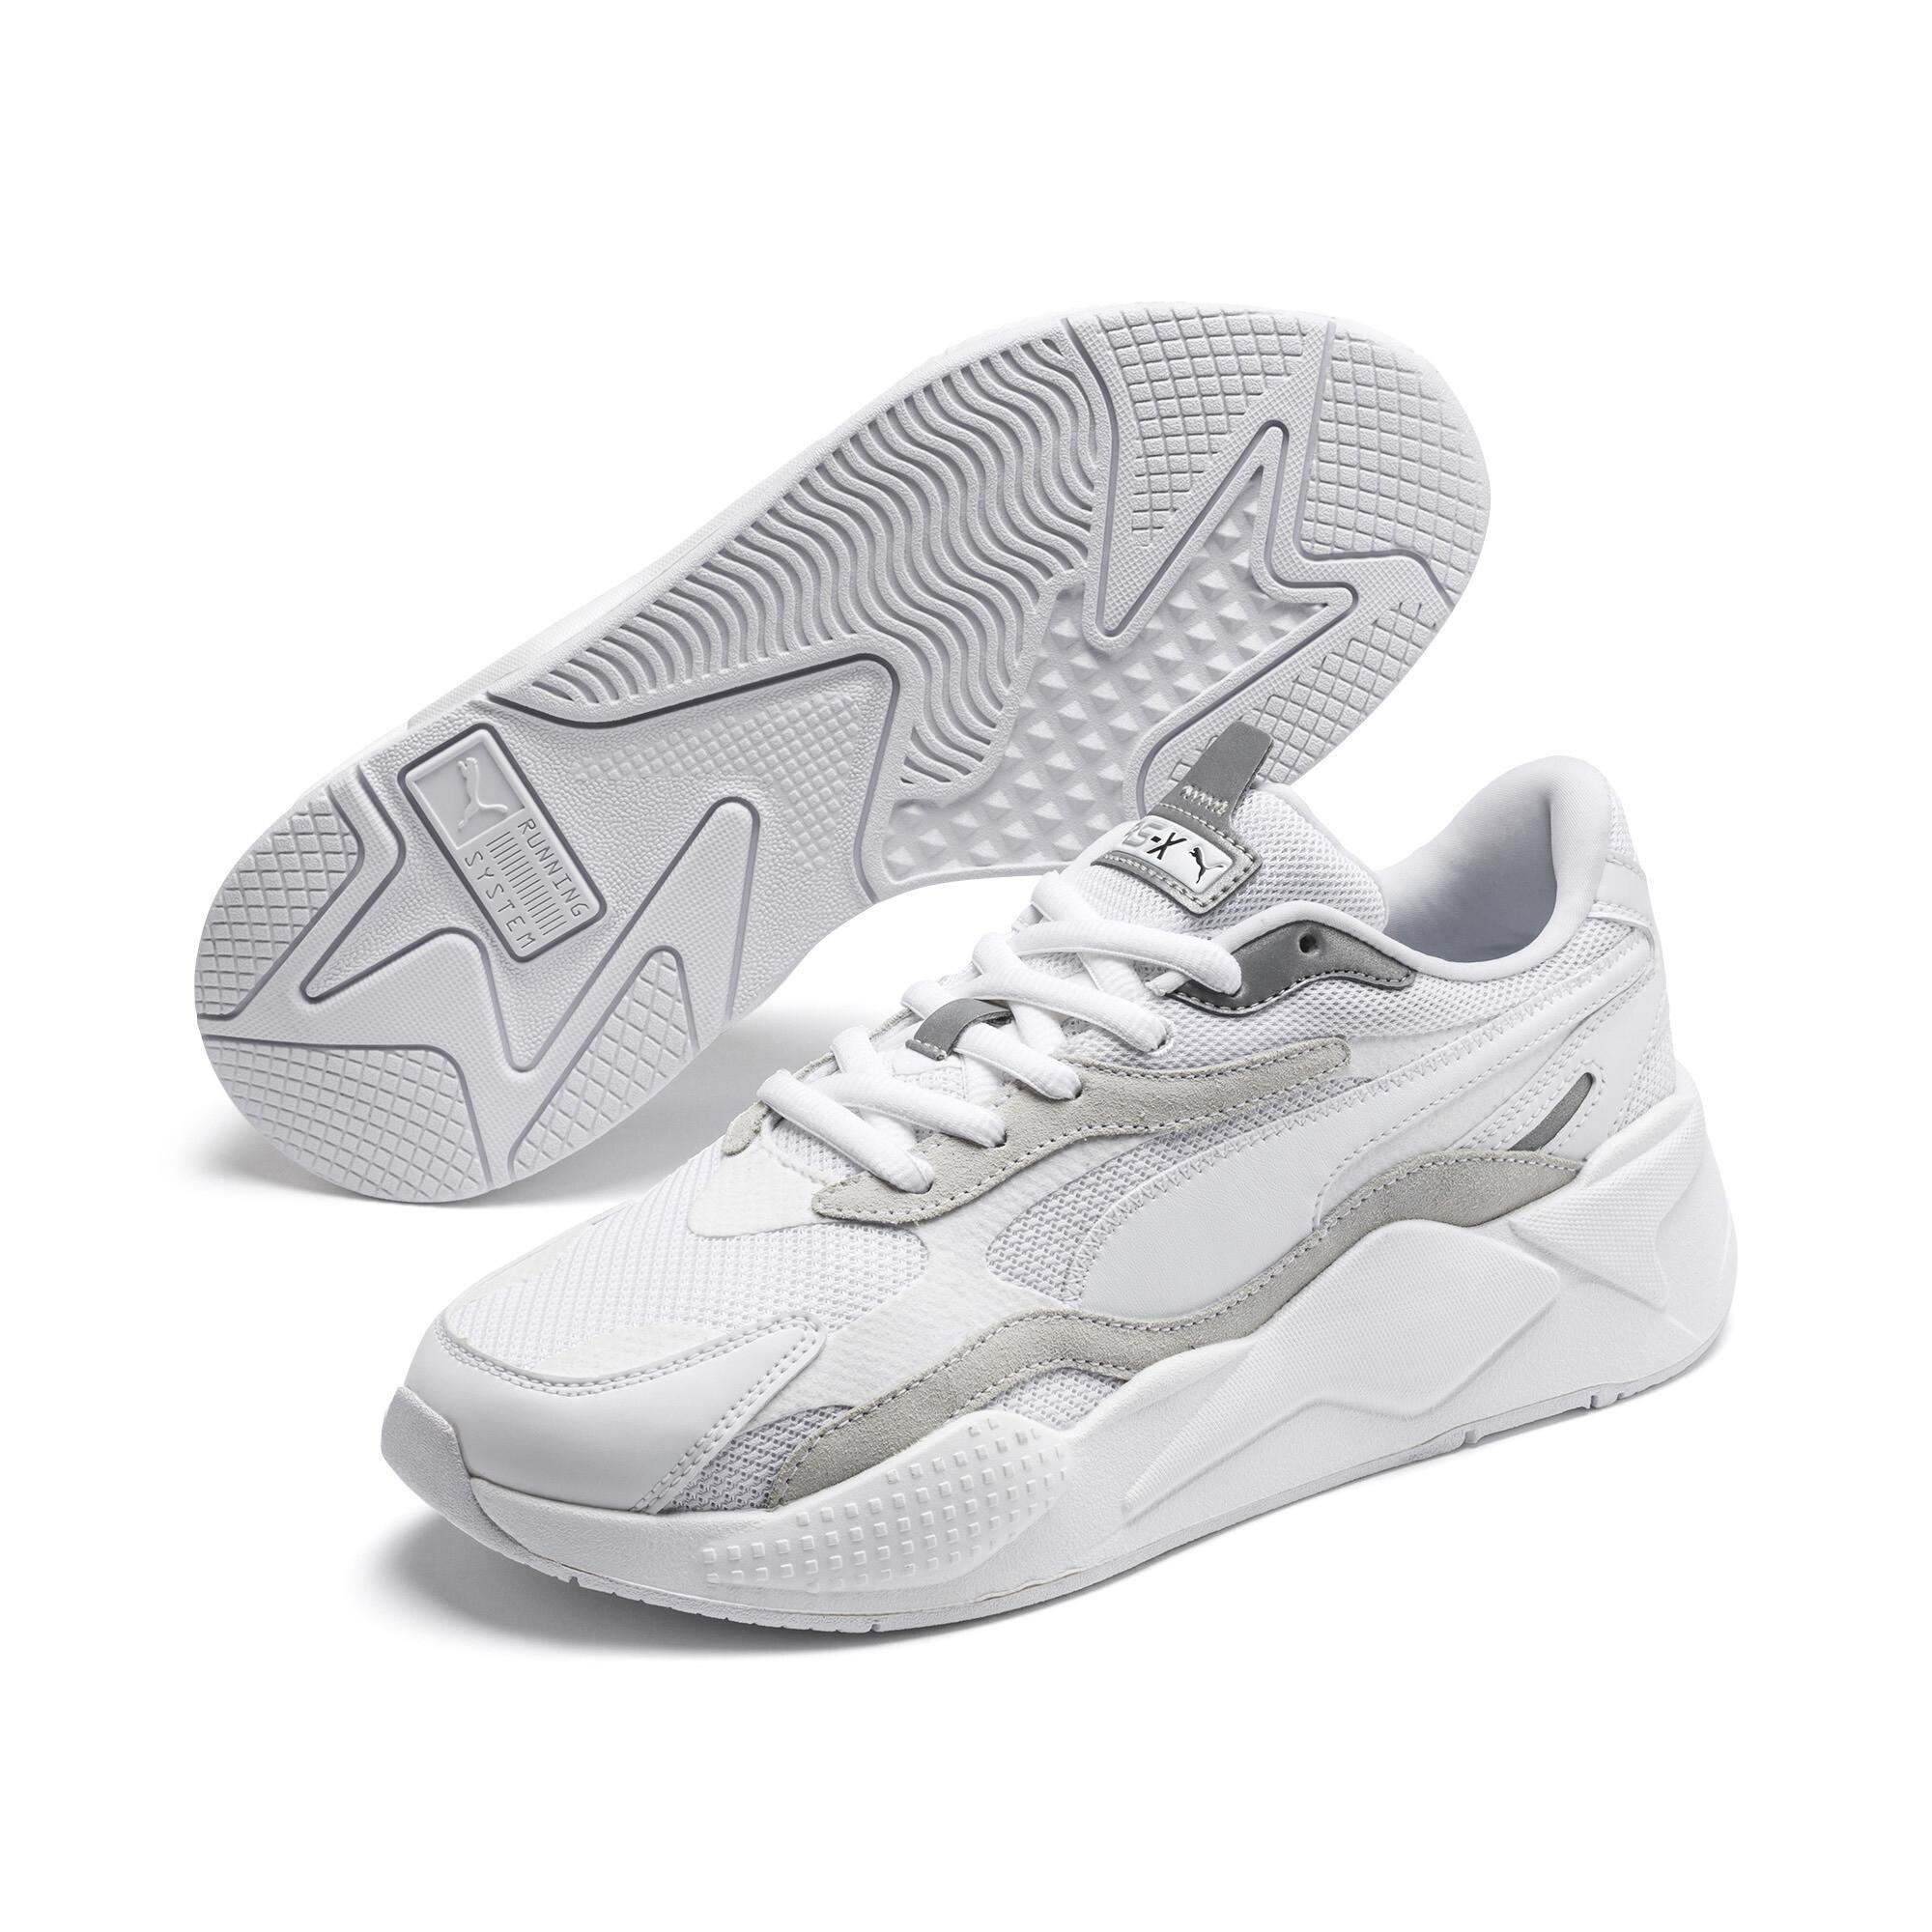 PUMA-Men-039-s-RS-X-Puzzle-Sneakers thumbnail 15